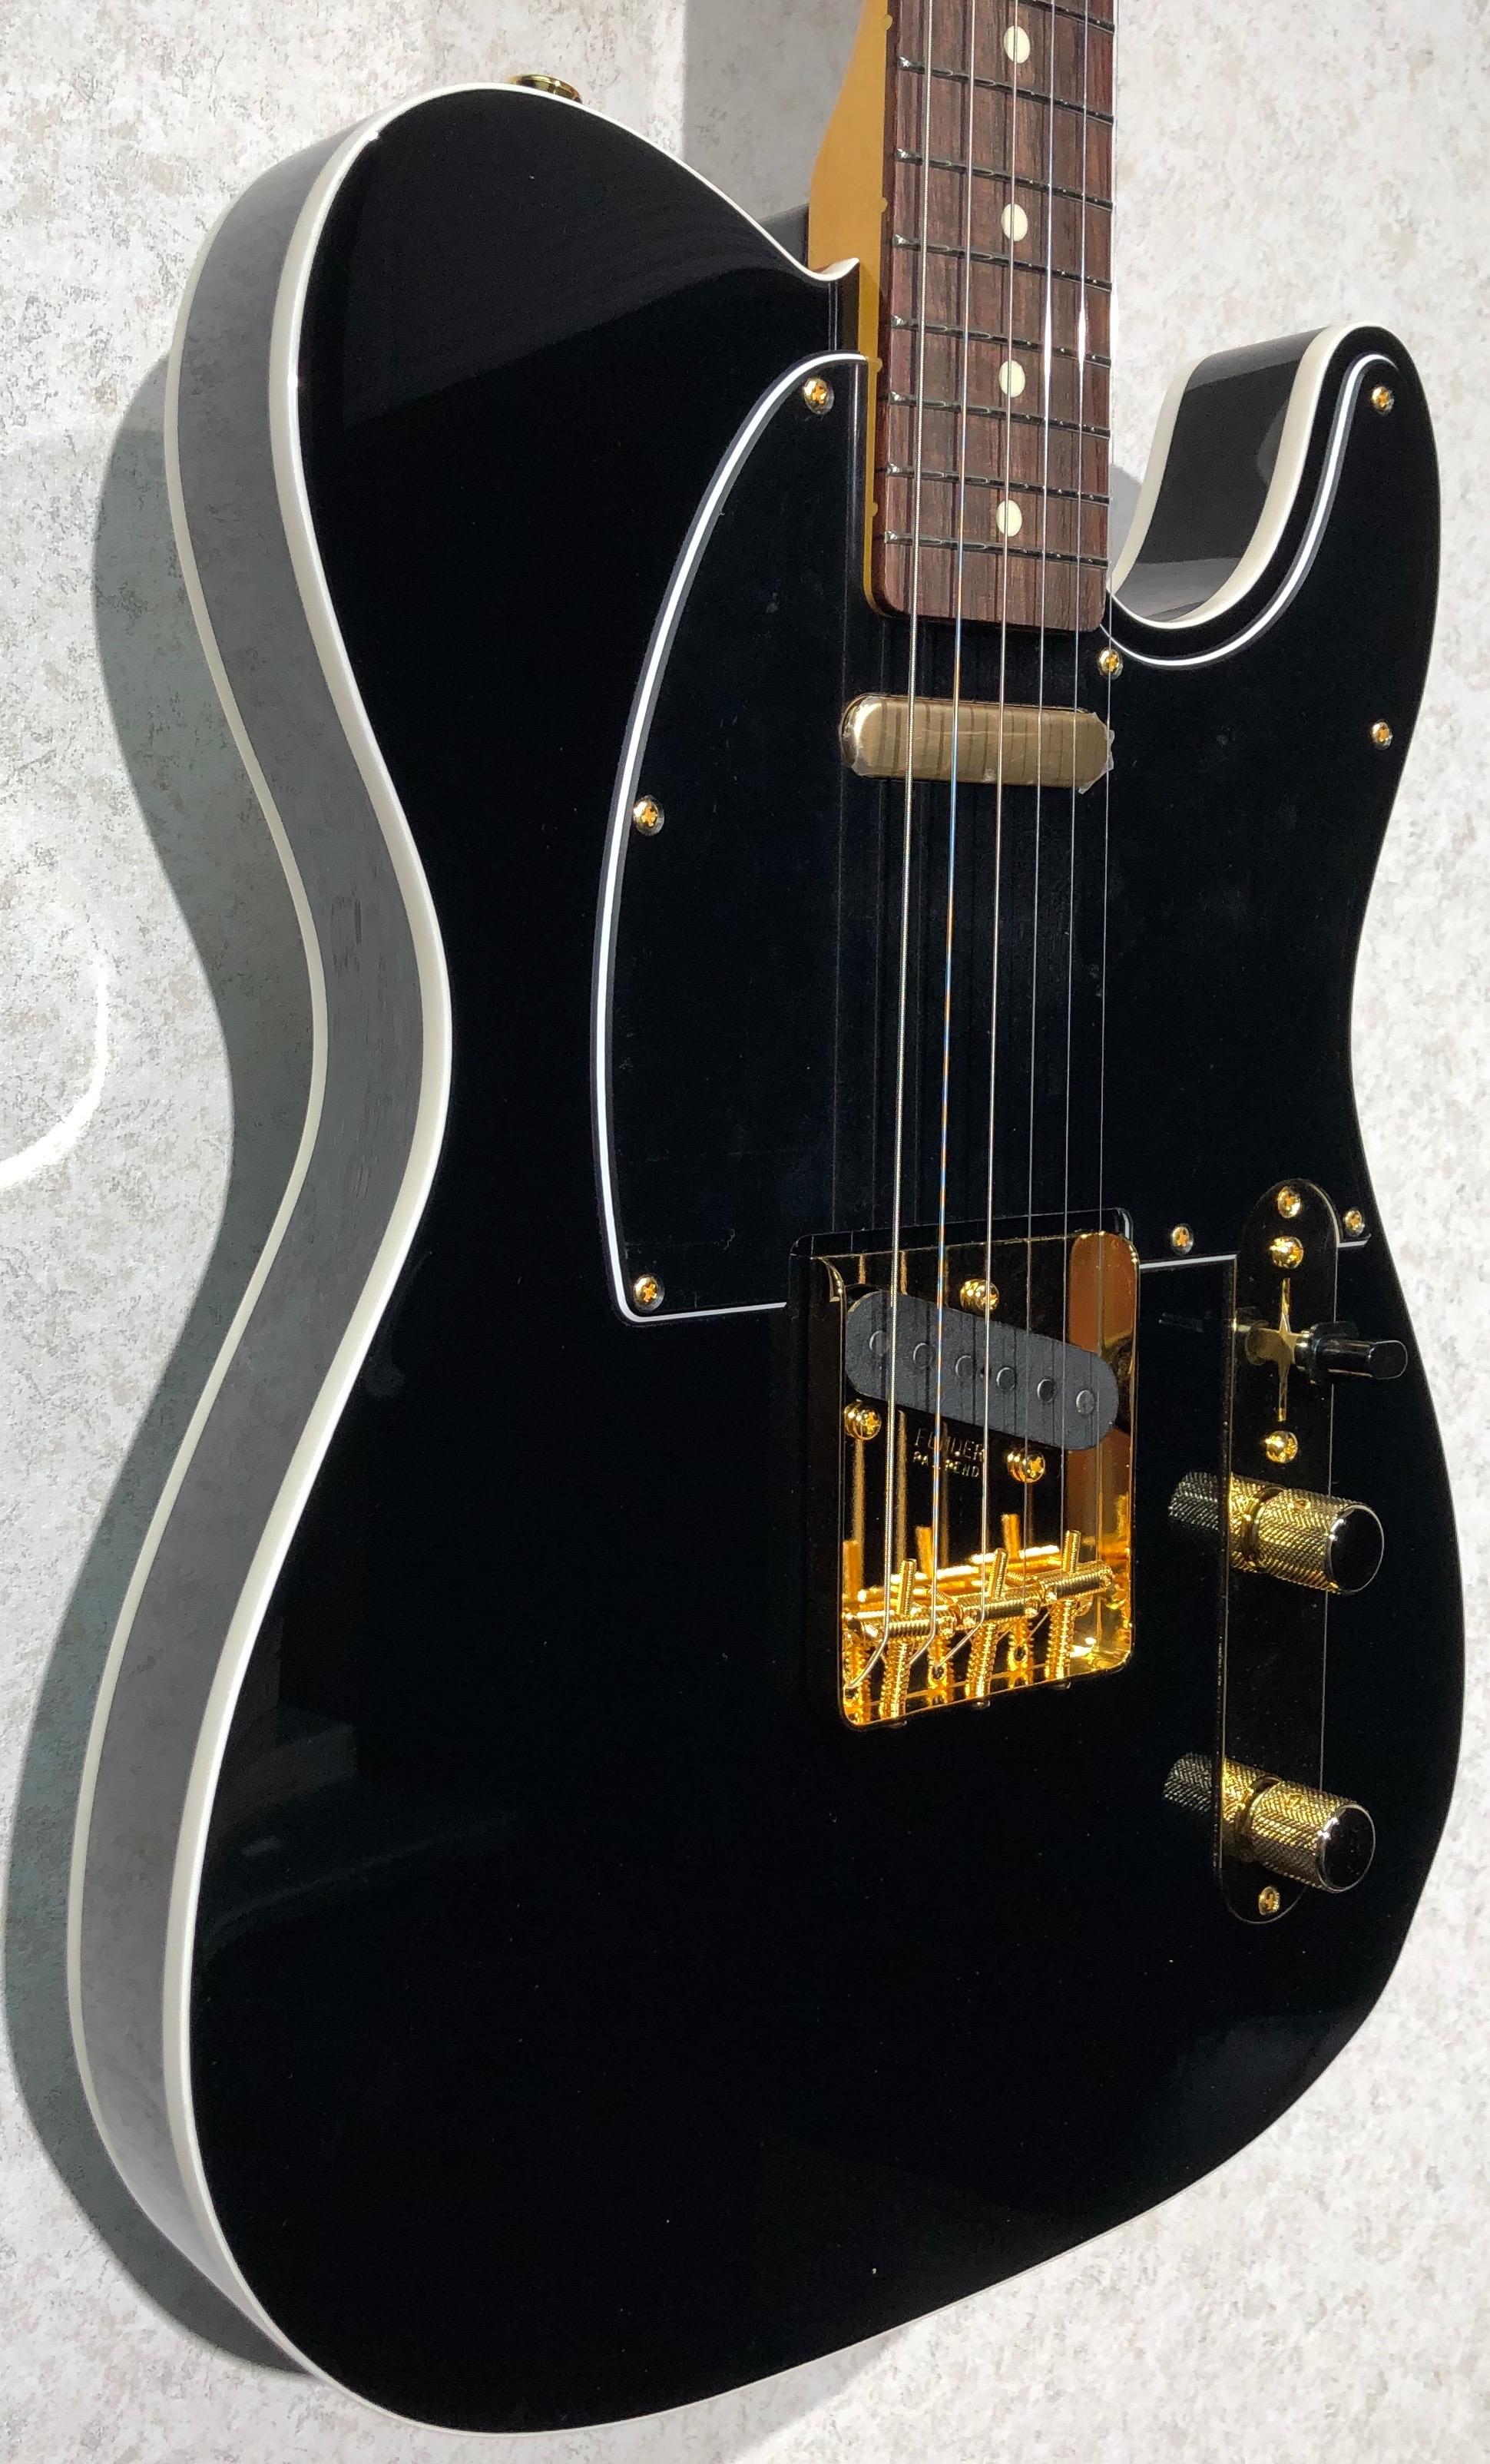 Fender FSR Traditional '60s Midnight Telecaster Made in Japan